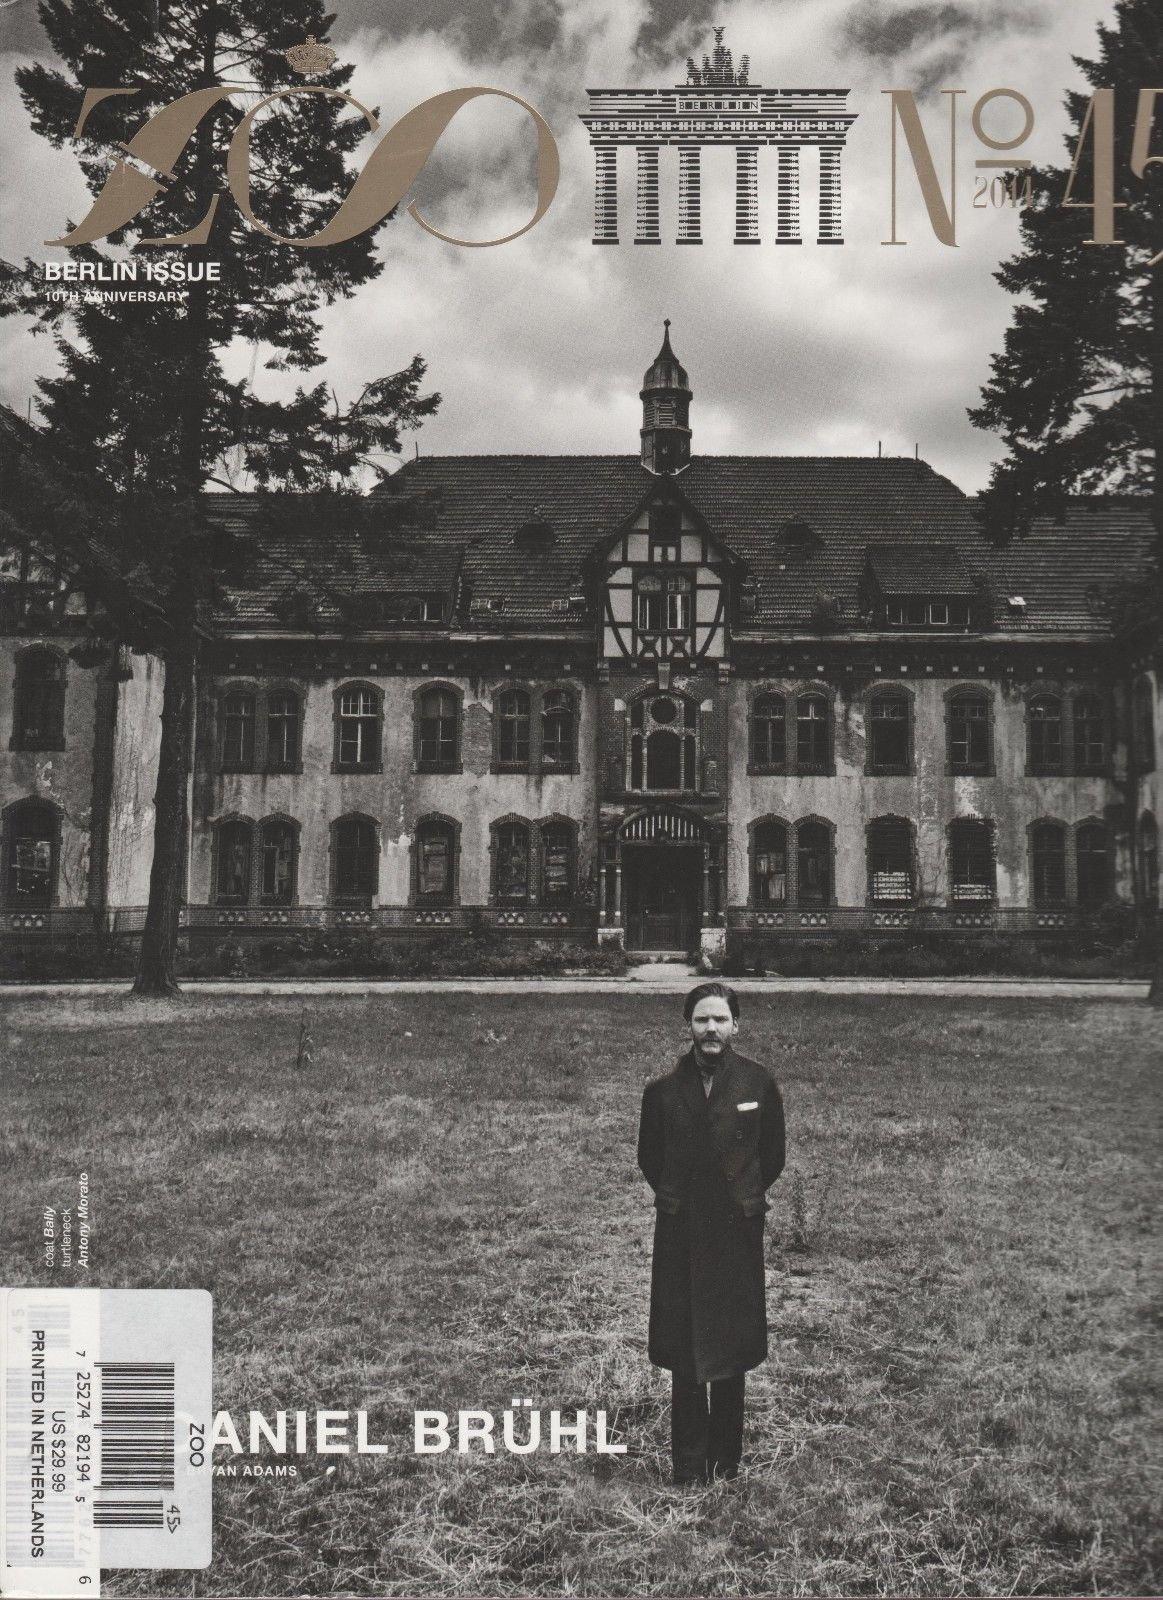 ZOO MAGAZINE #45 2014, BERLIN ISSUE 10th ANNIVERSARY, DANIEL BRUHL, FASHION.